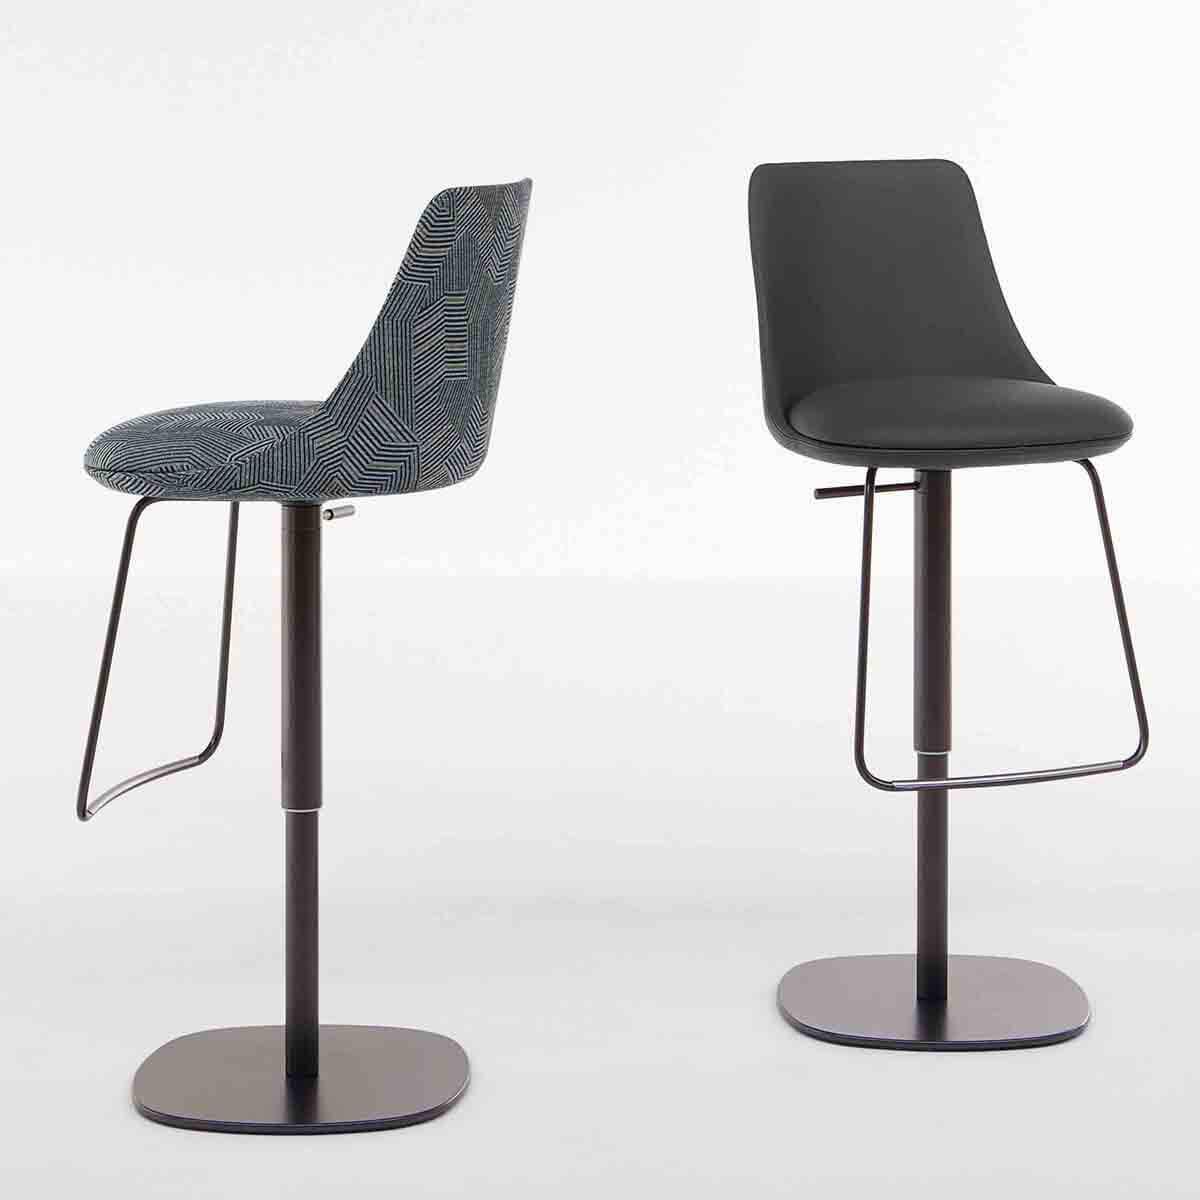 Бар стол Itala Too от Bonaldo, Италия